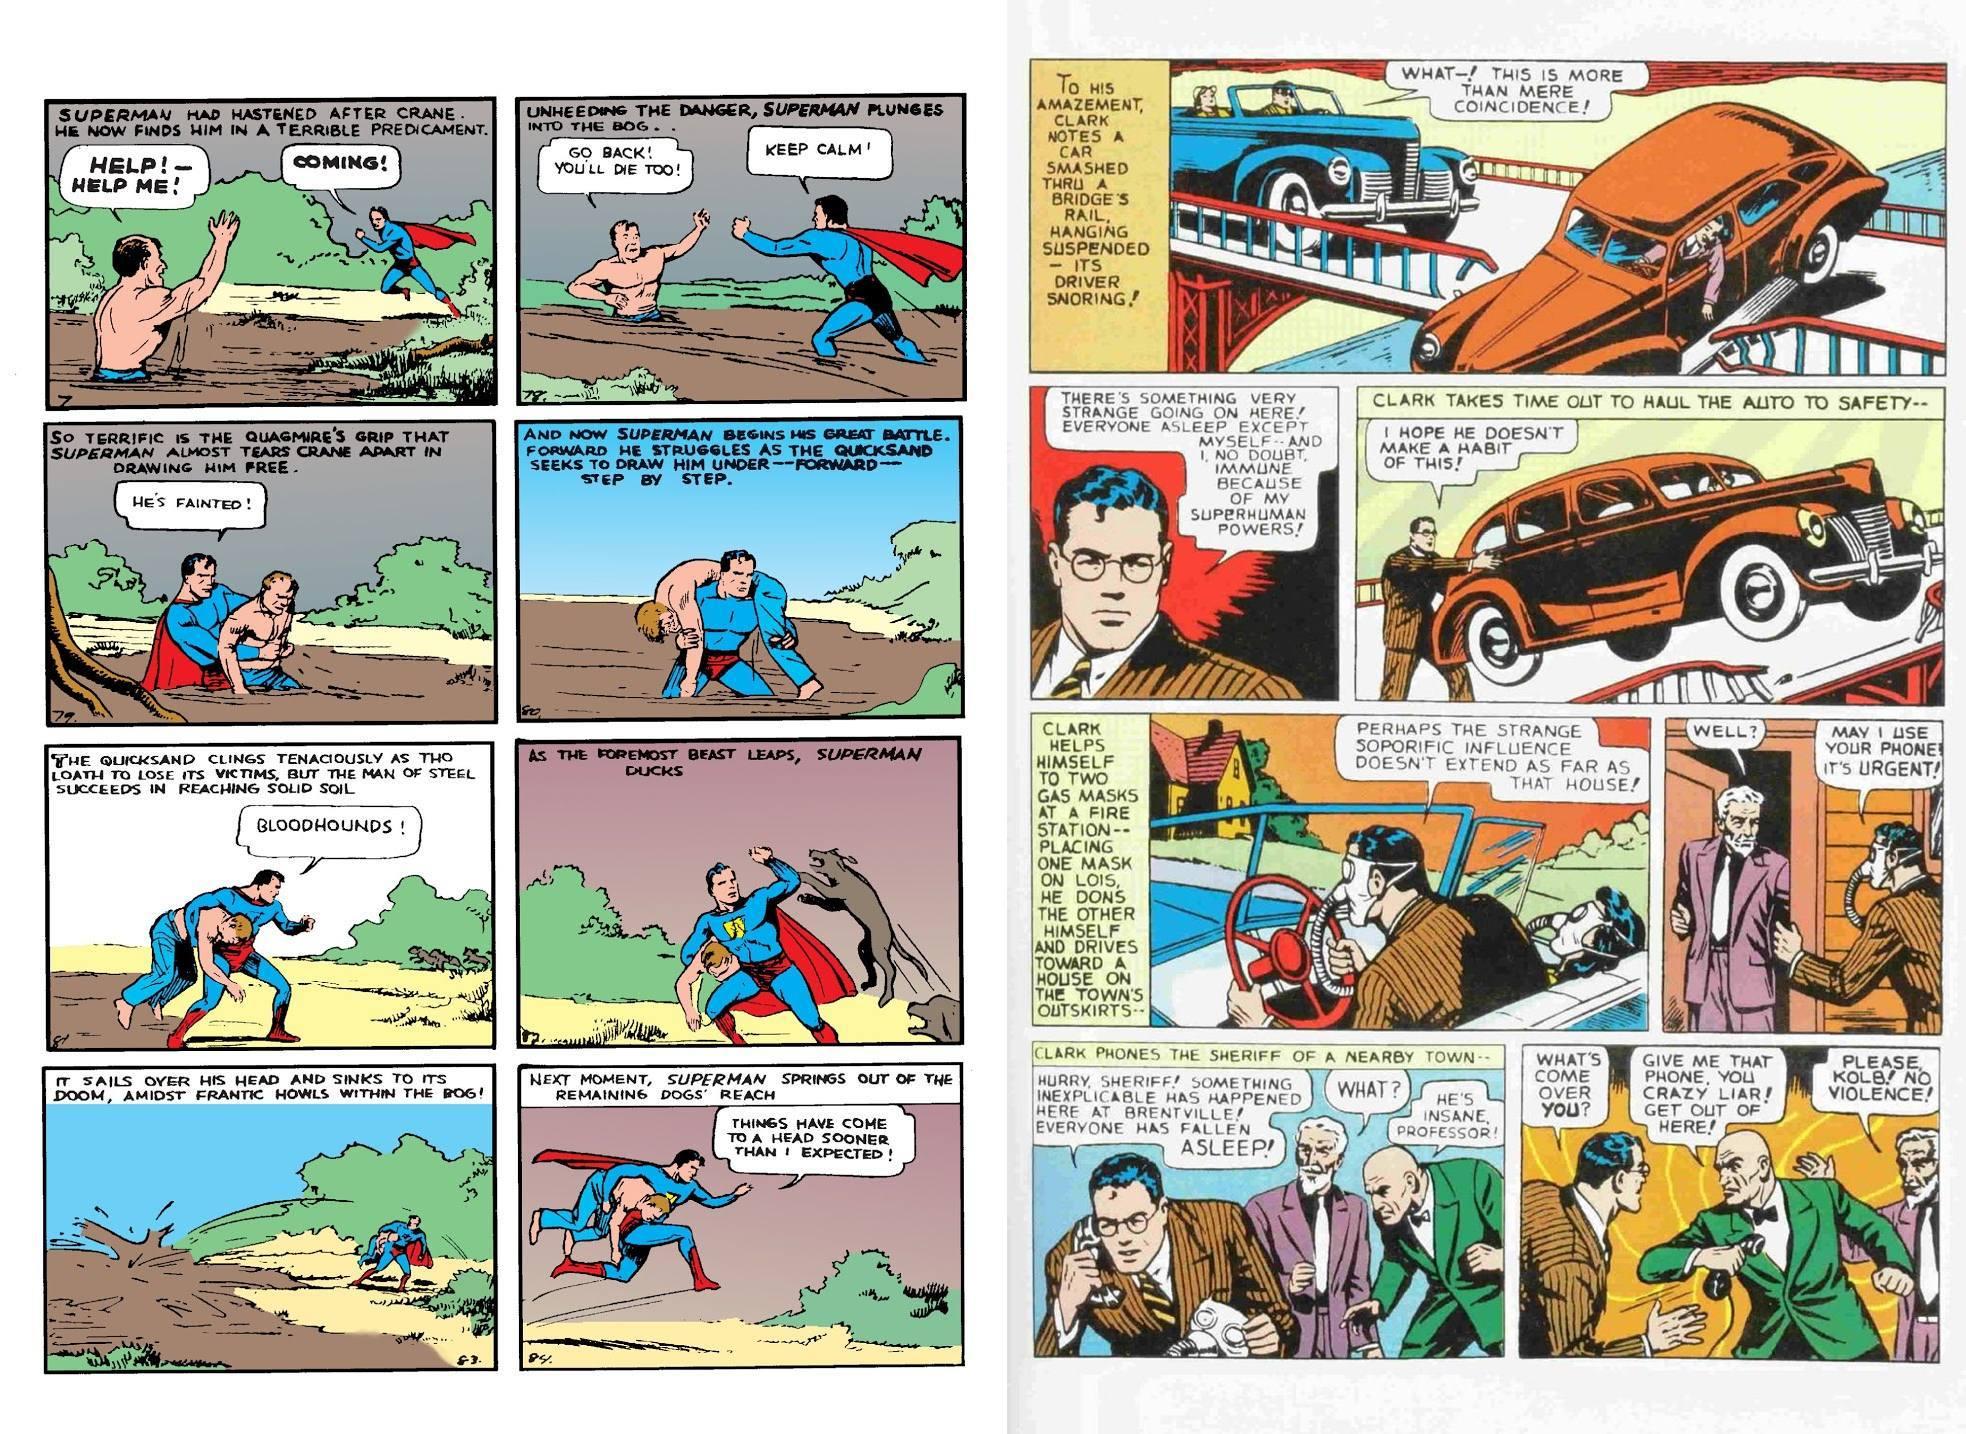 Superman The Golden Age Omnibus Vol. 1 review